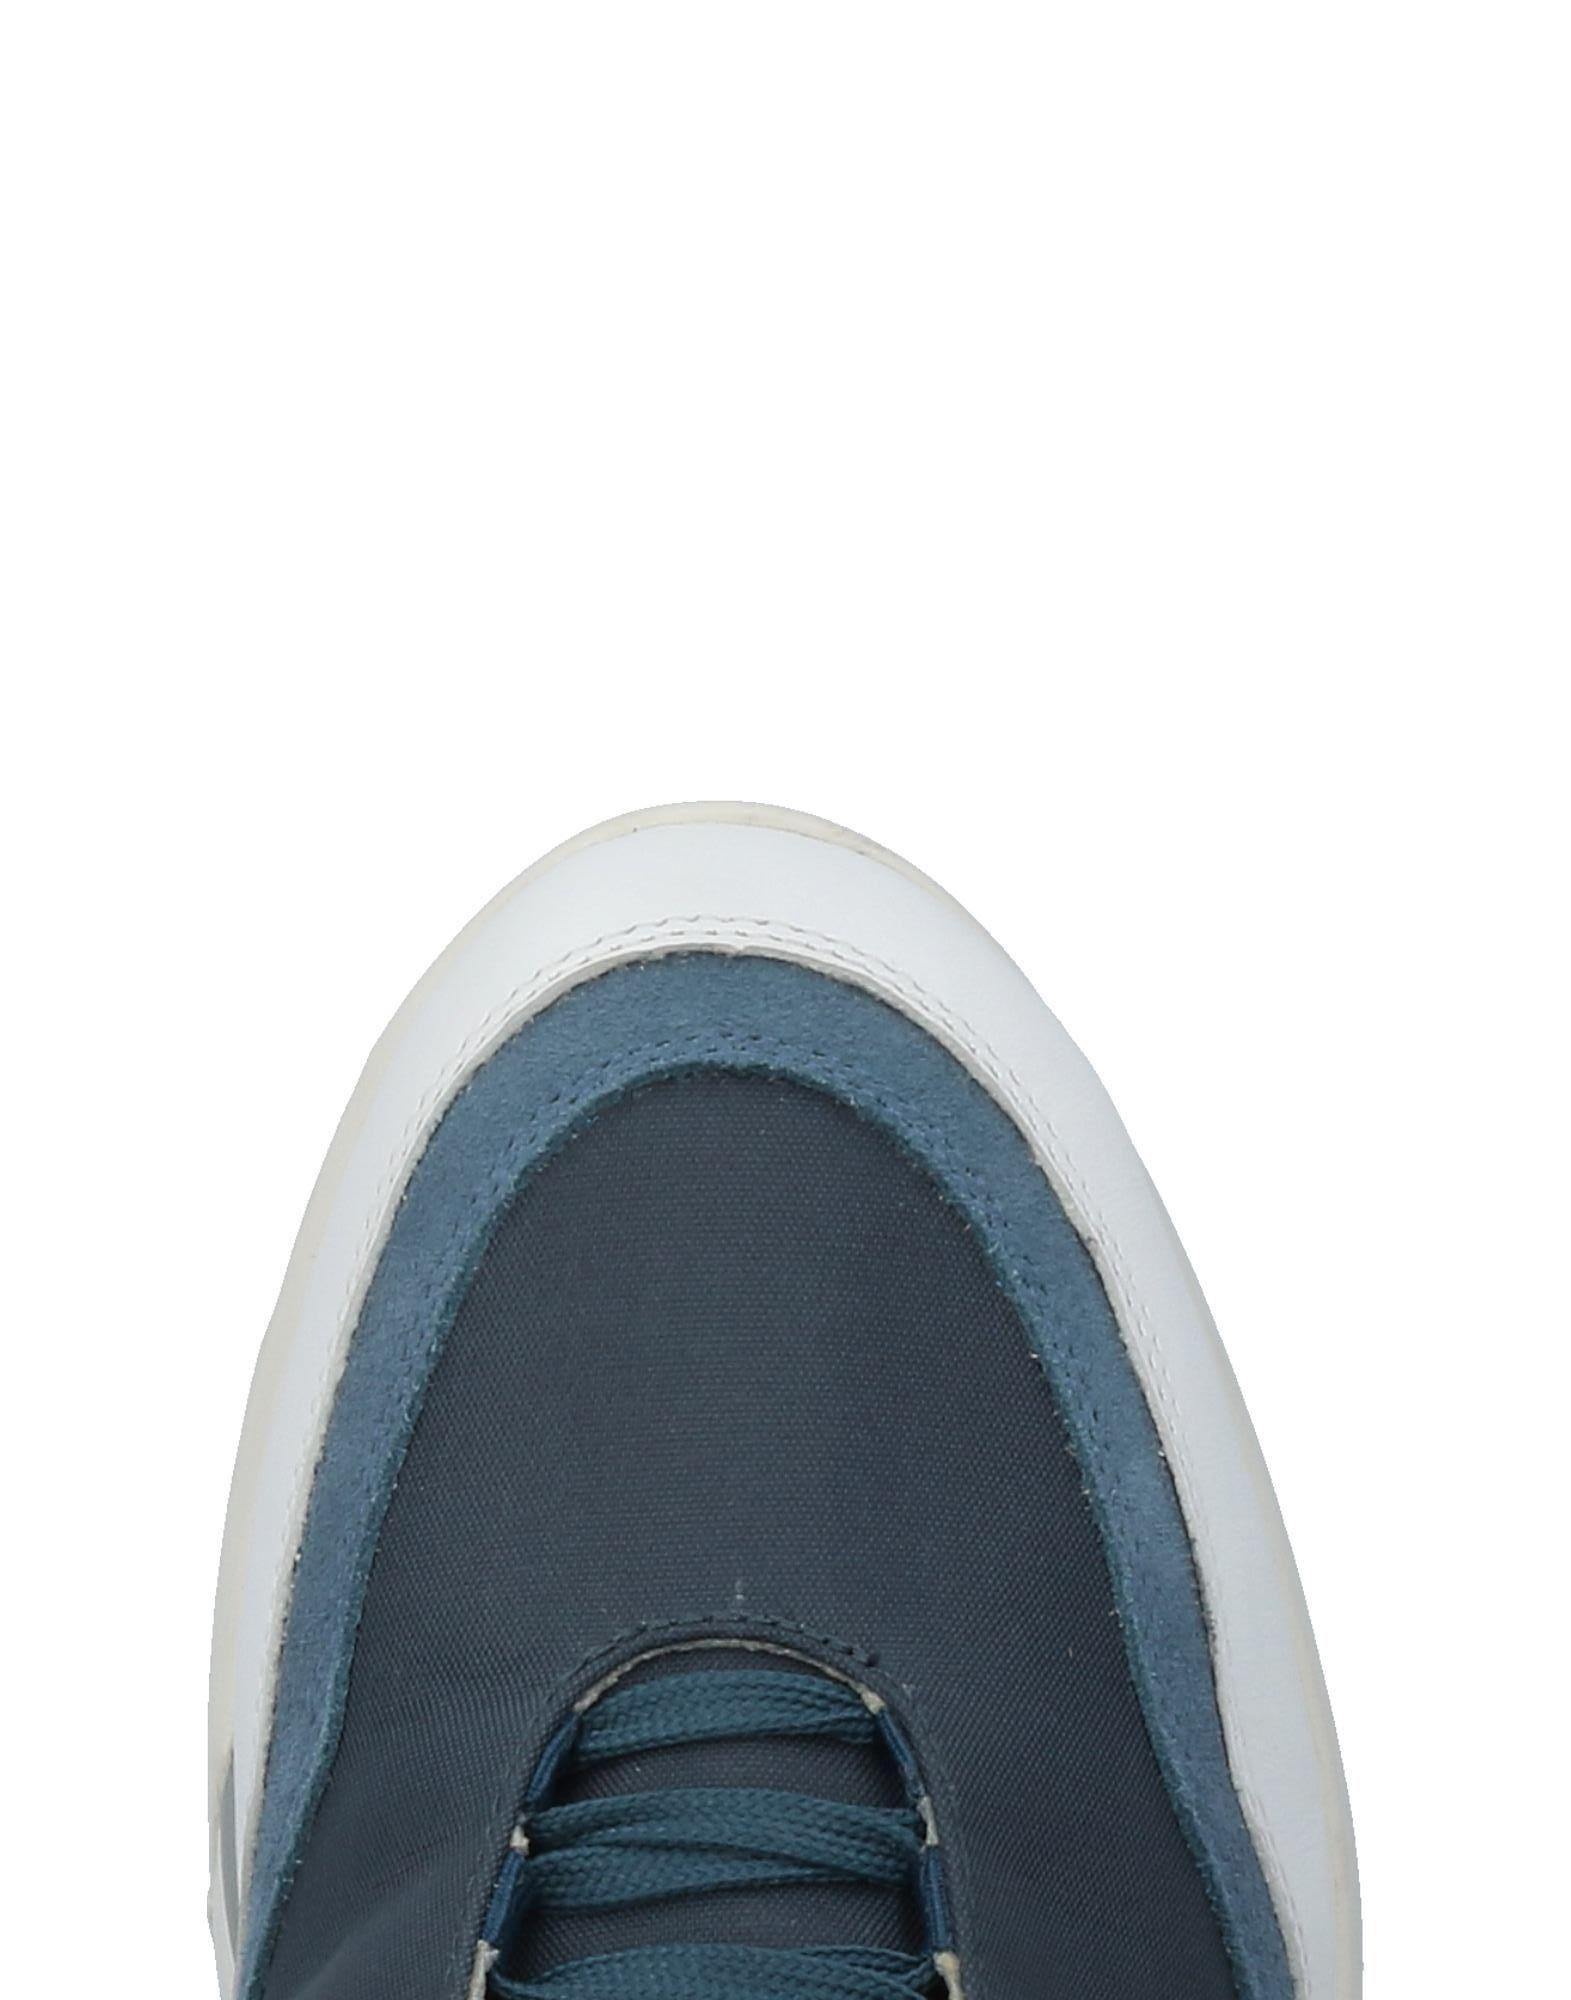 Soisire Soiebleu Sneakers Herren   11476136XR 80a083